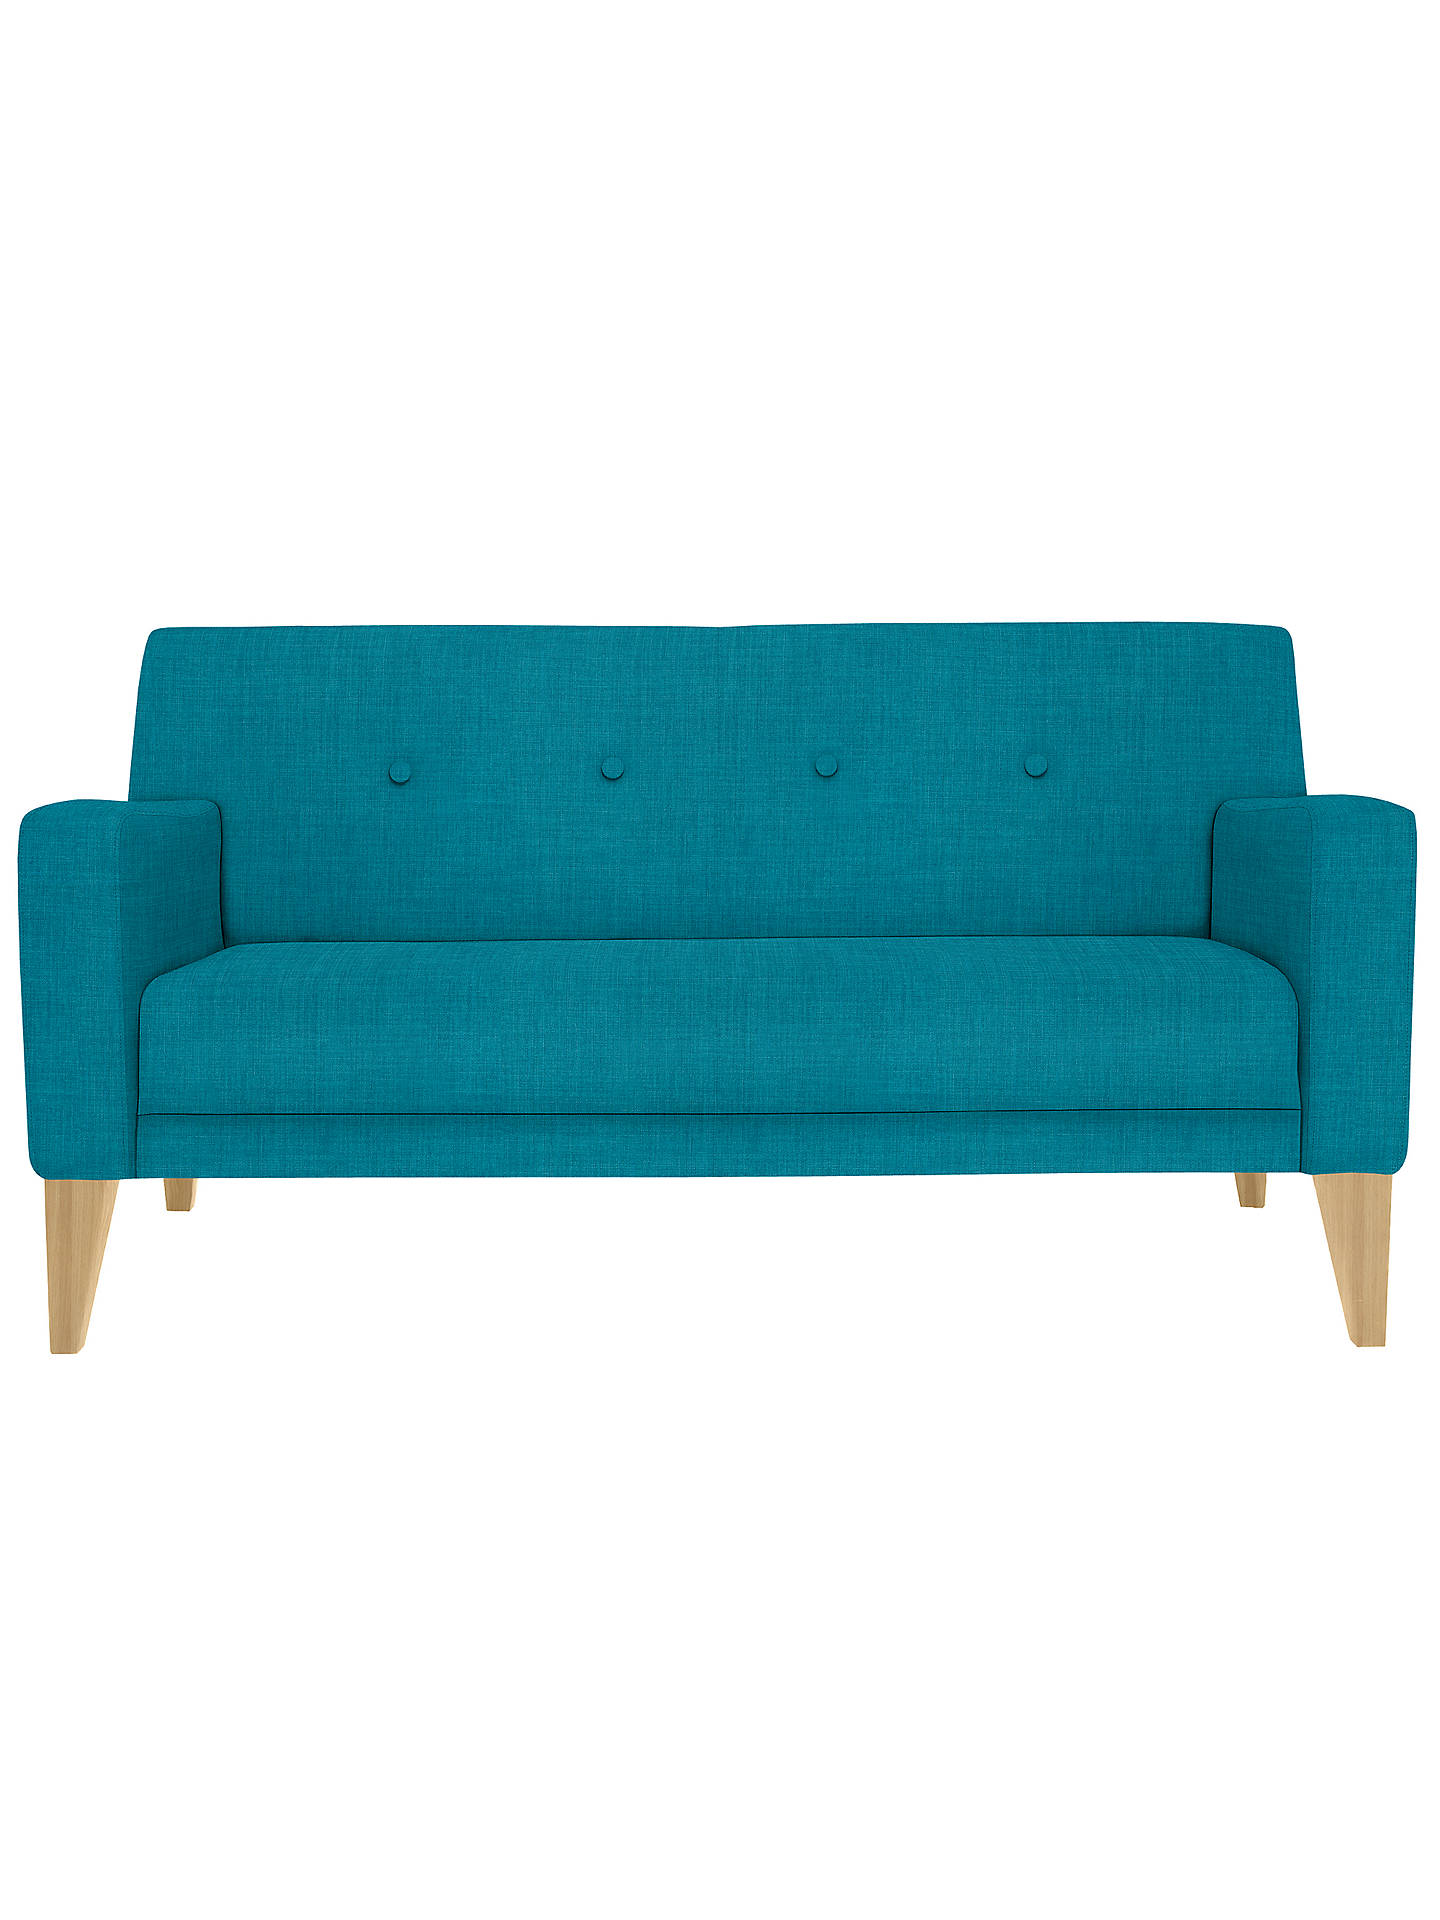 Awe Inspiring House By John Lewis Louis Small 2 Seater Sofa Light Legs Theyellowbook Wood Chair Design Ideas Theyellowbookinfo